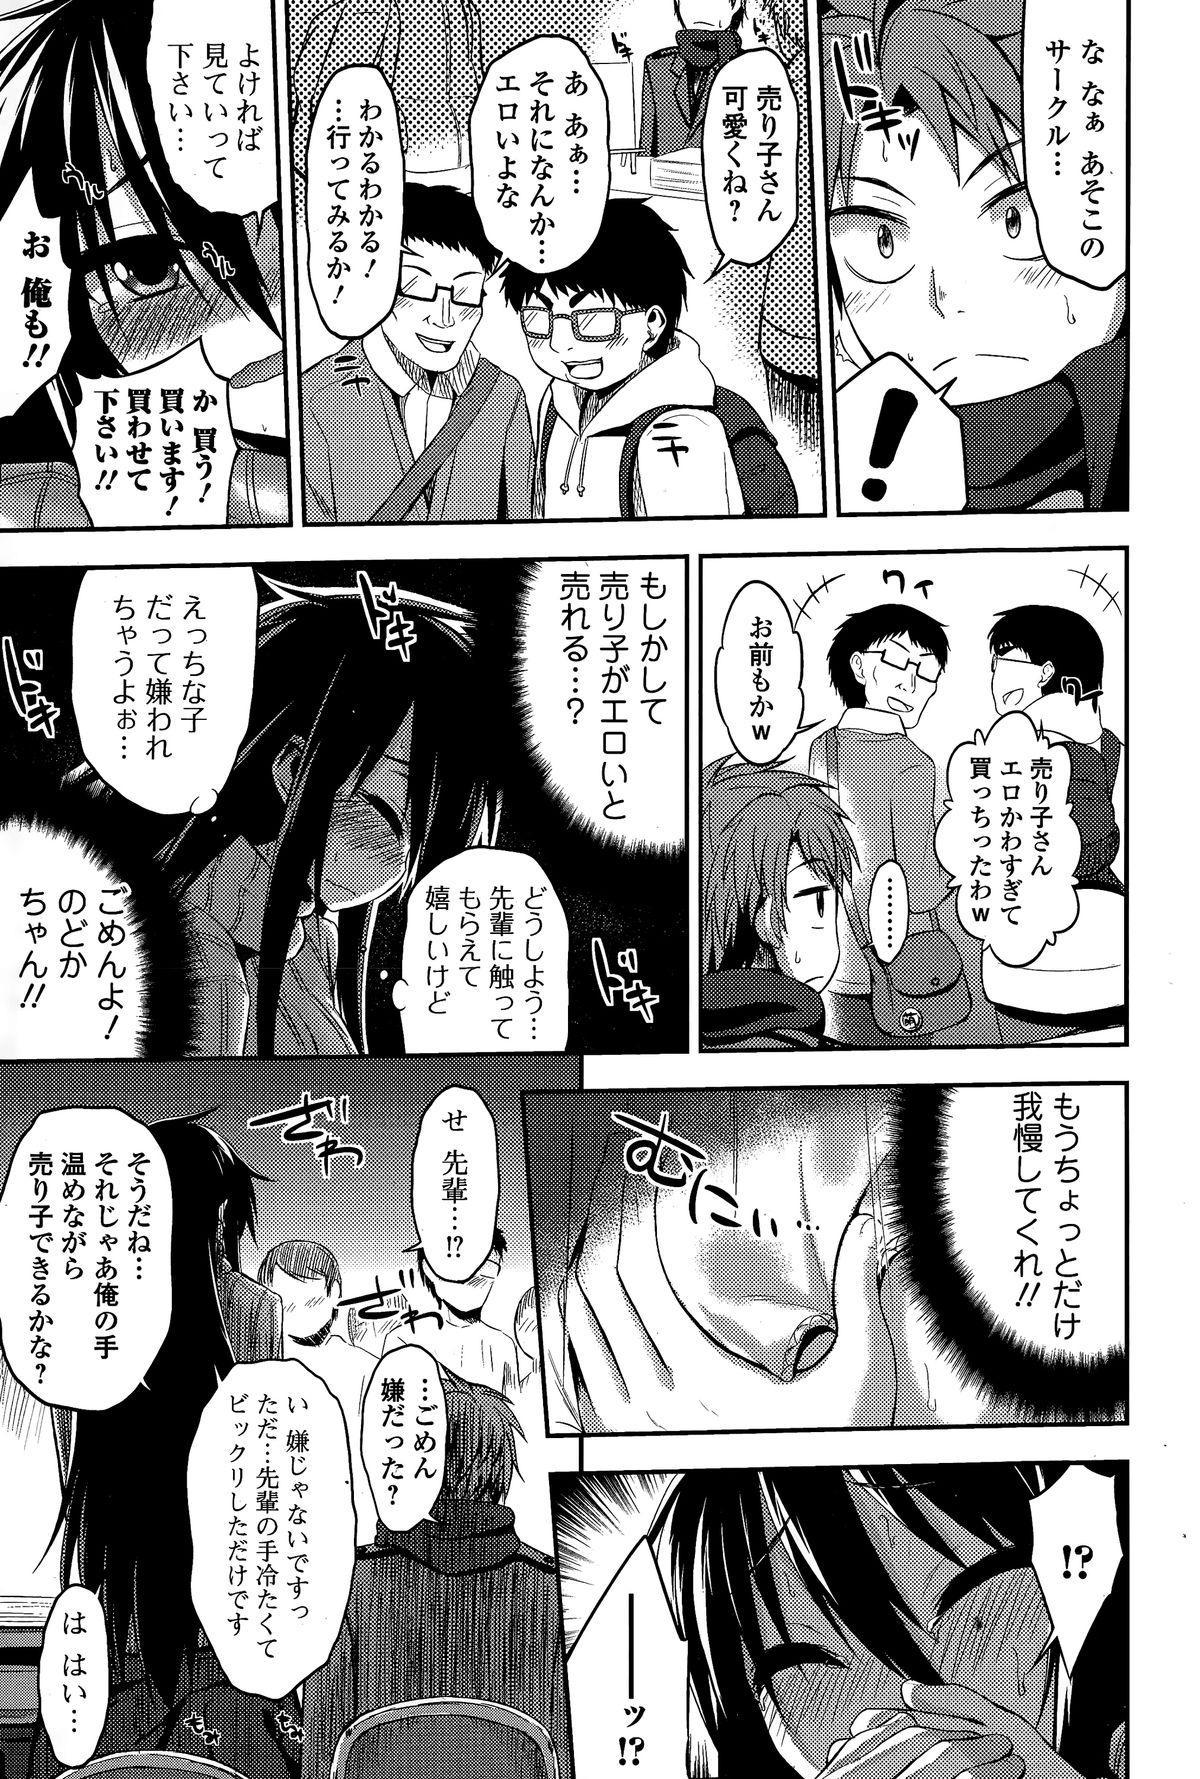 Comic Toutetsu 2015-02 Vol. 3 68